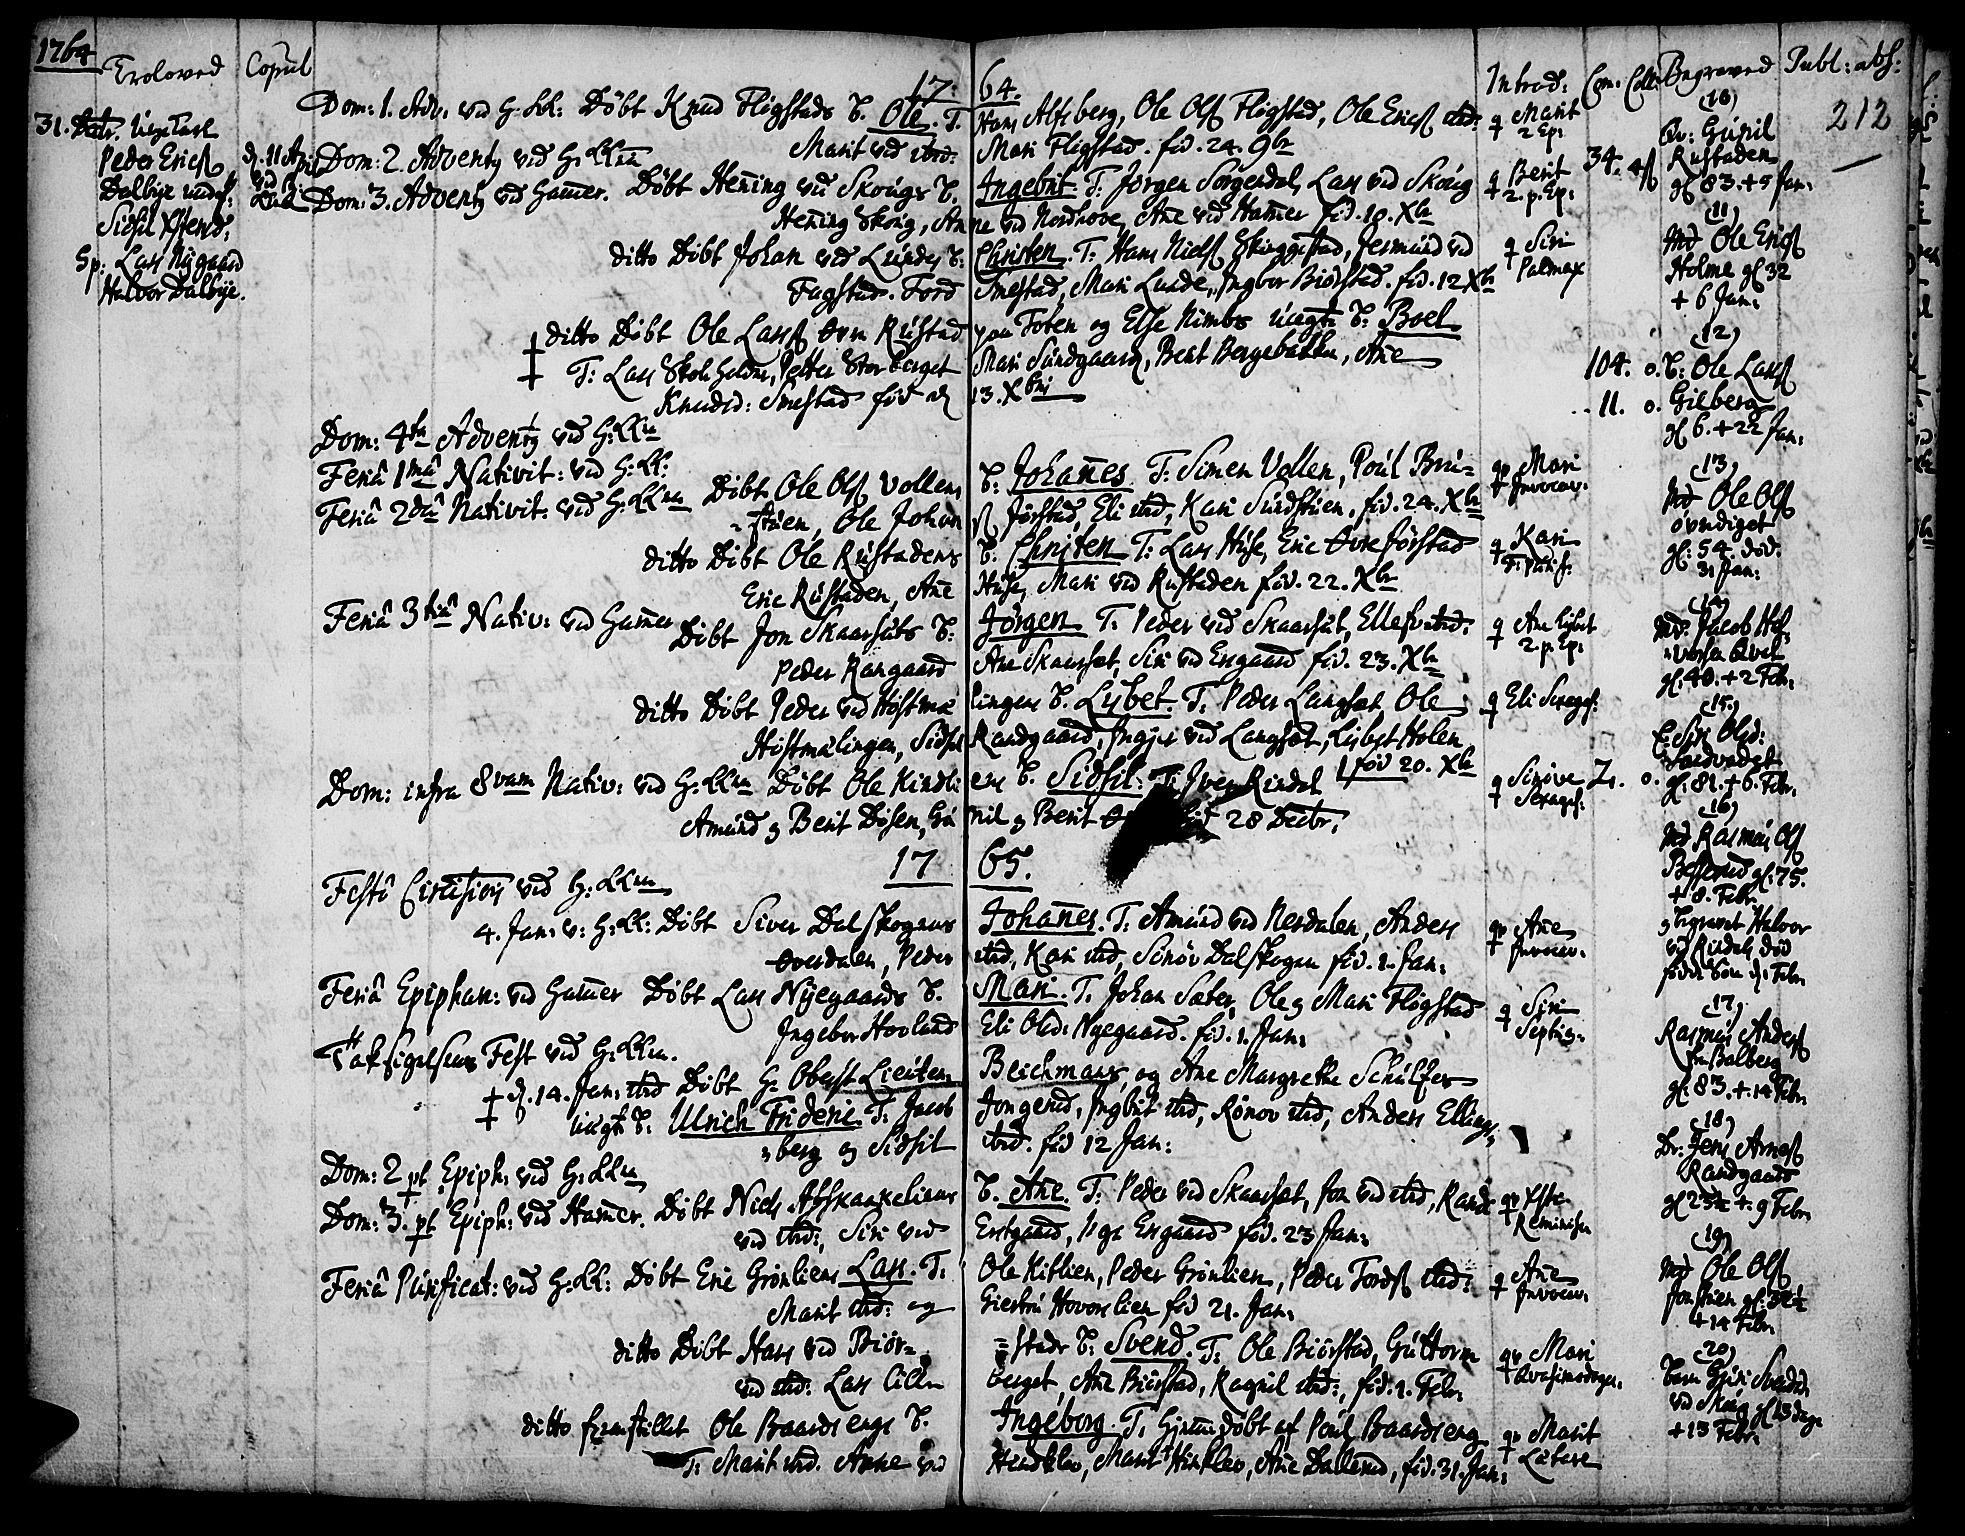 SAH, Fåberg prestekontor, Ministerialbok nr. 1, 1727-1775, s. 212